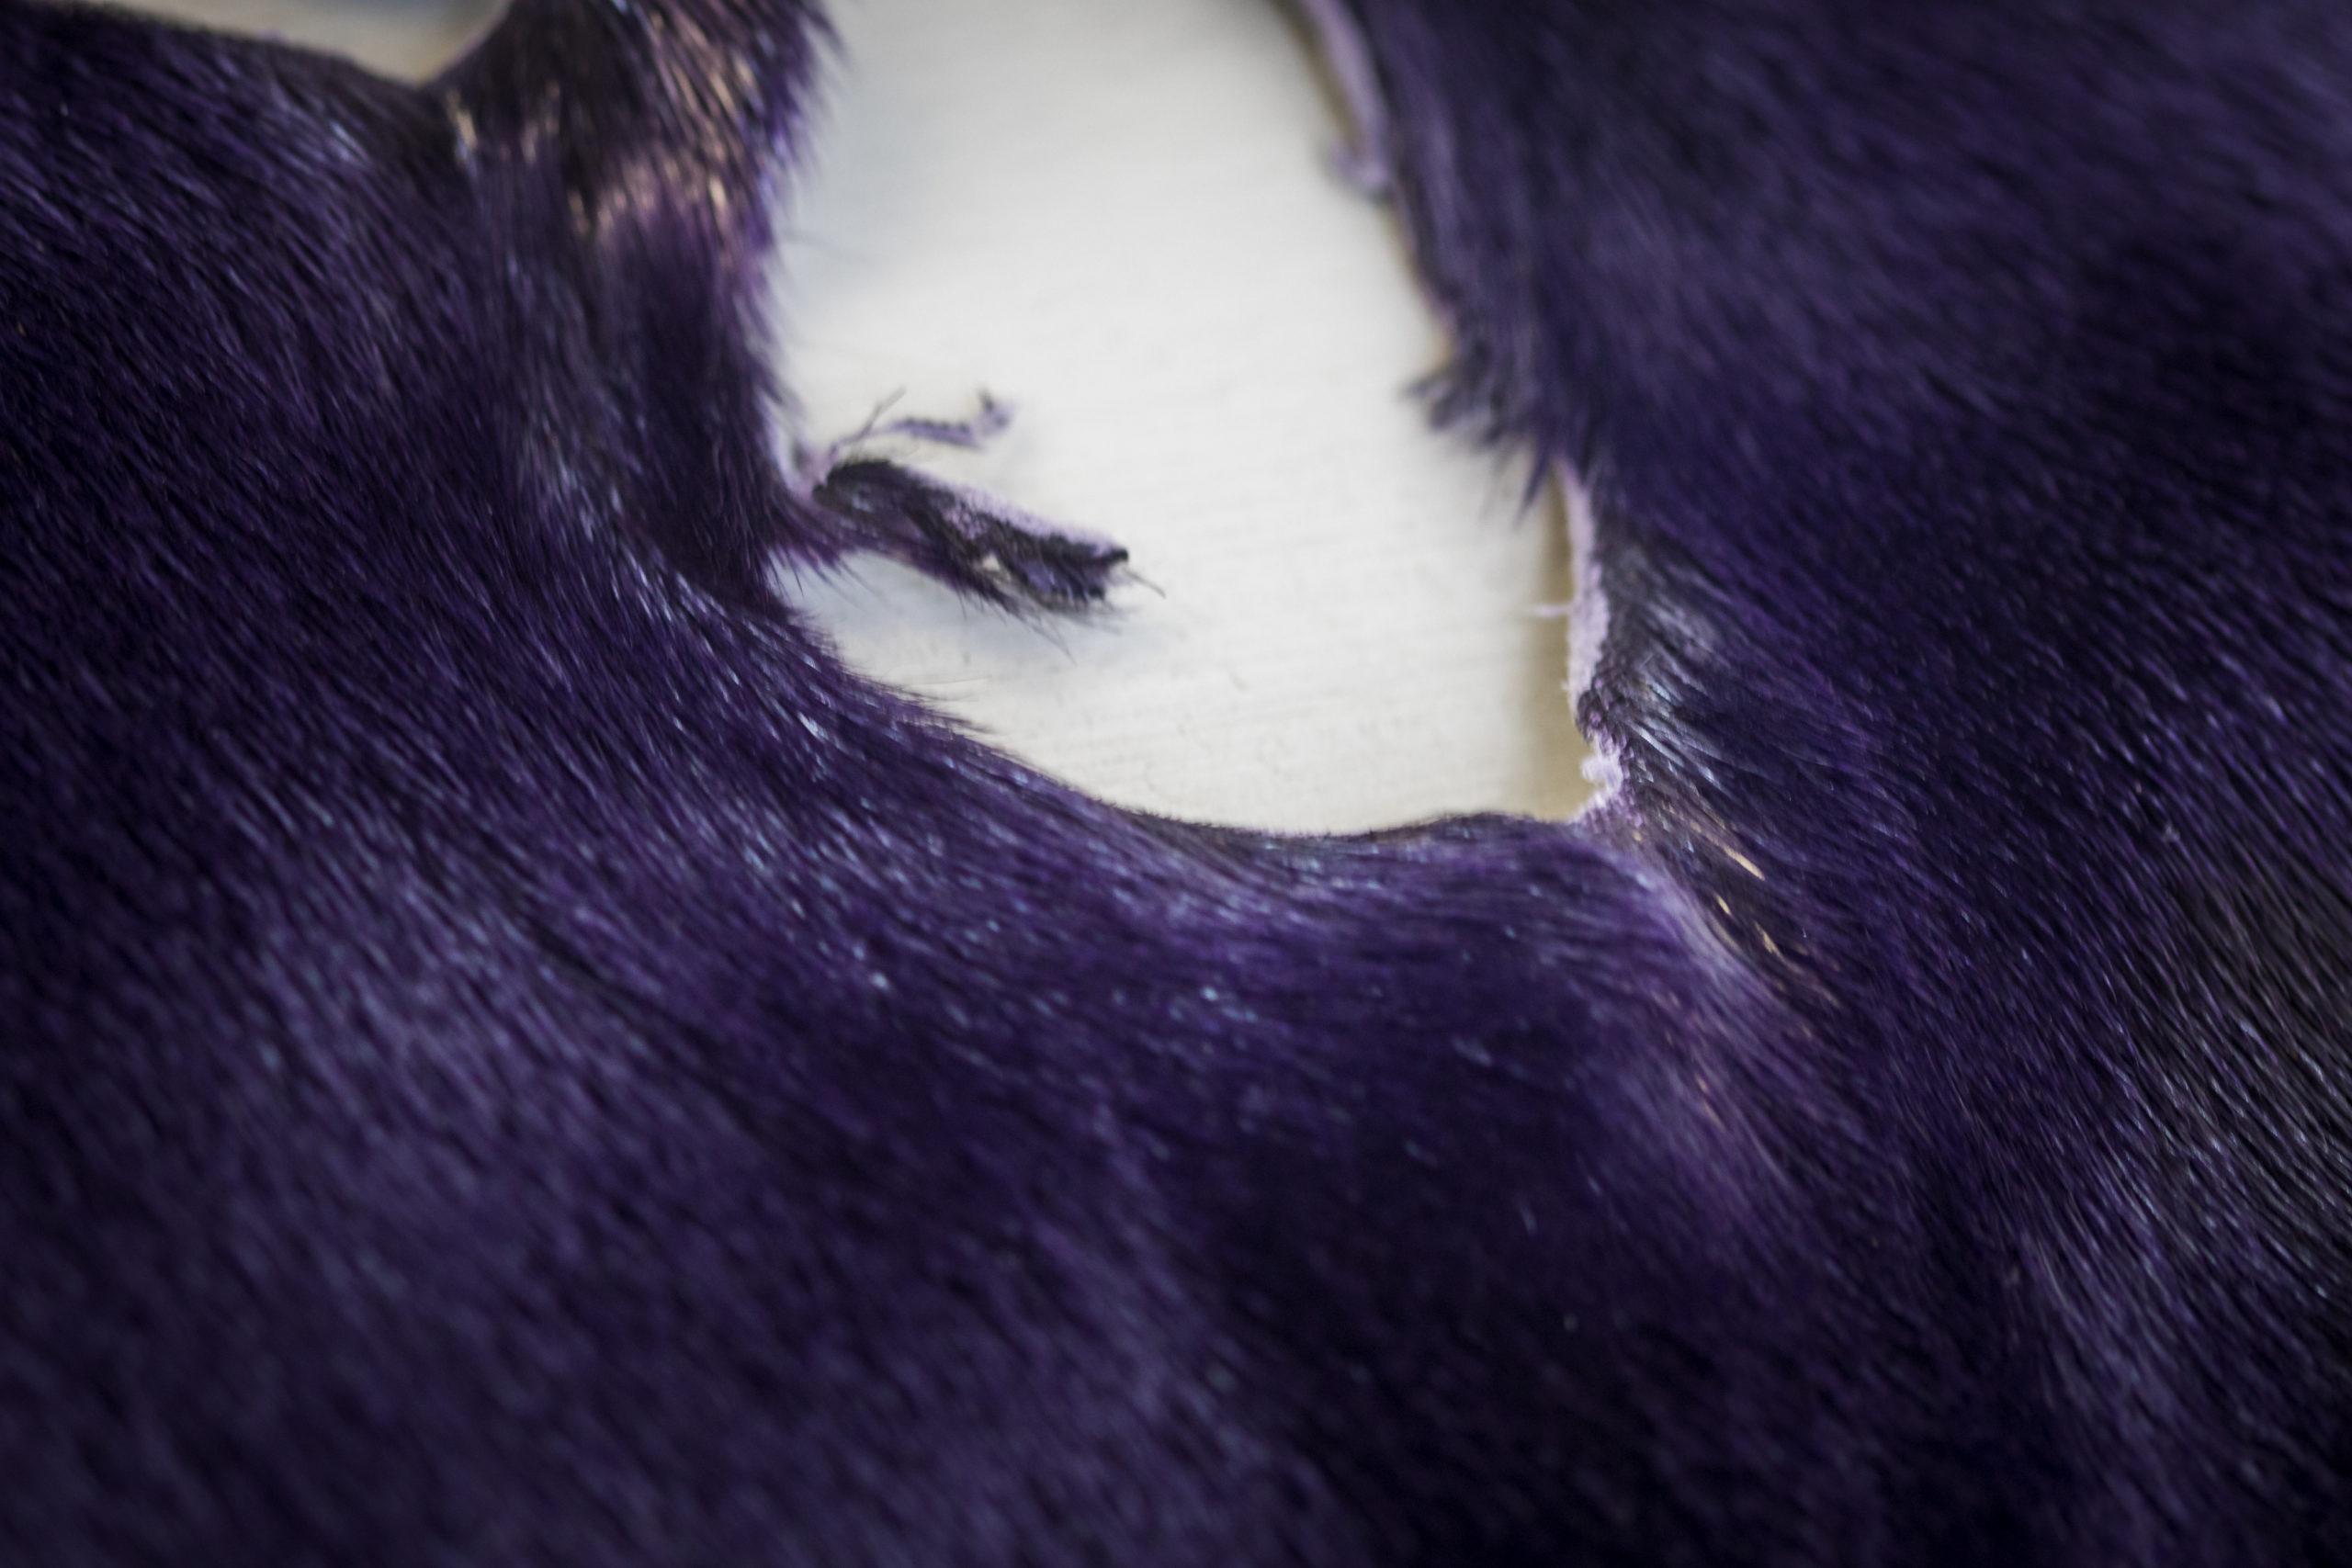 Purplehole